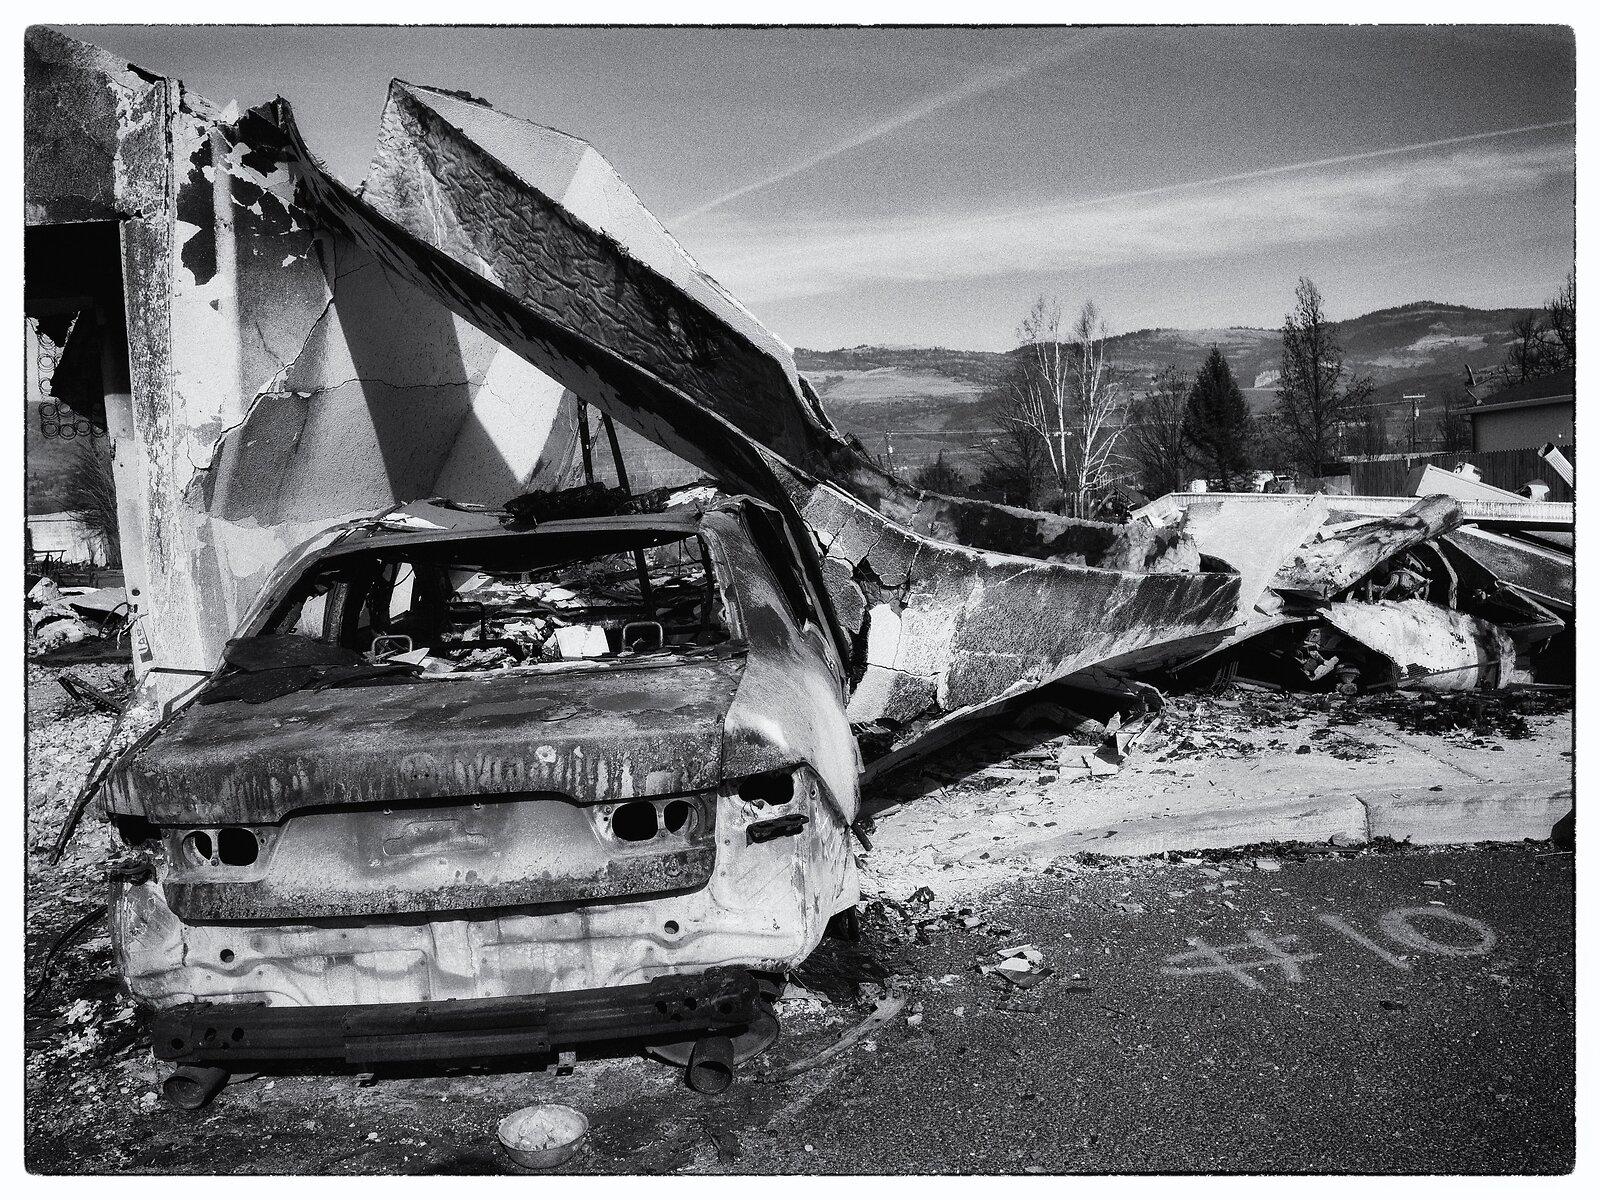 GX9_Feb10_21_burned_car.jpg